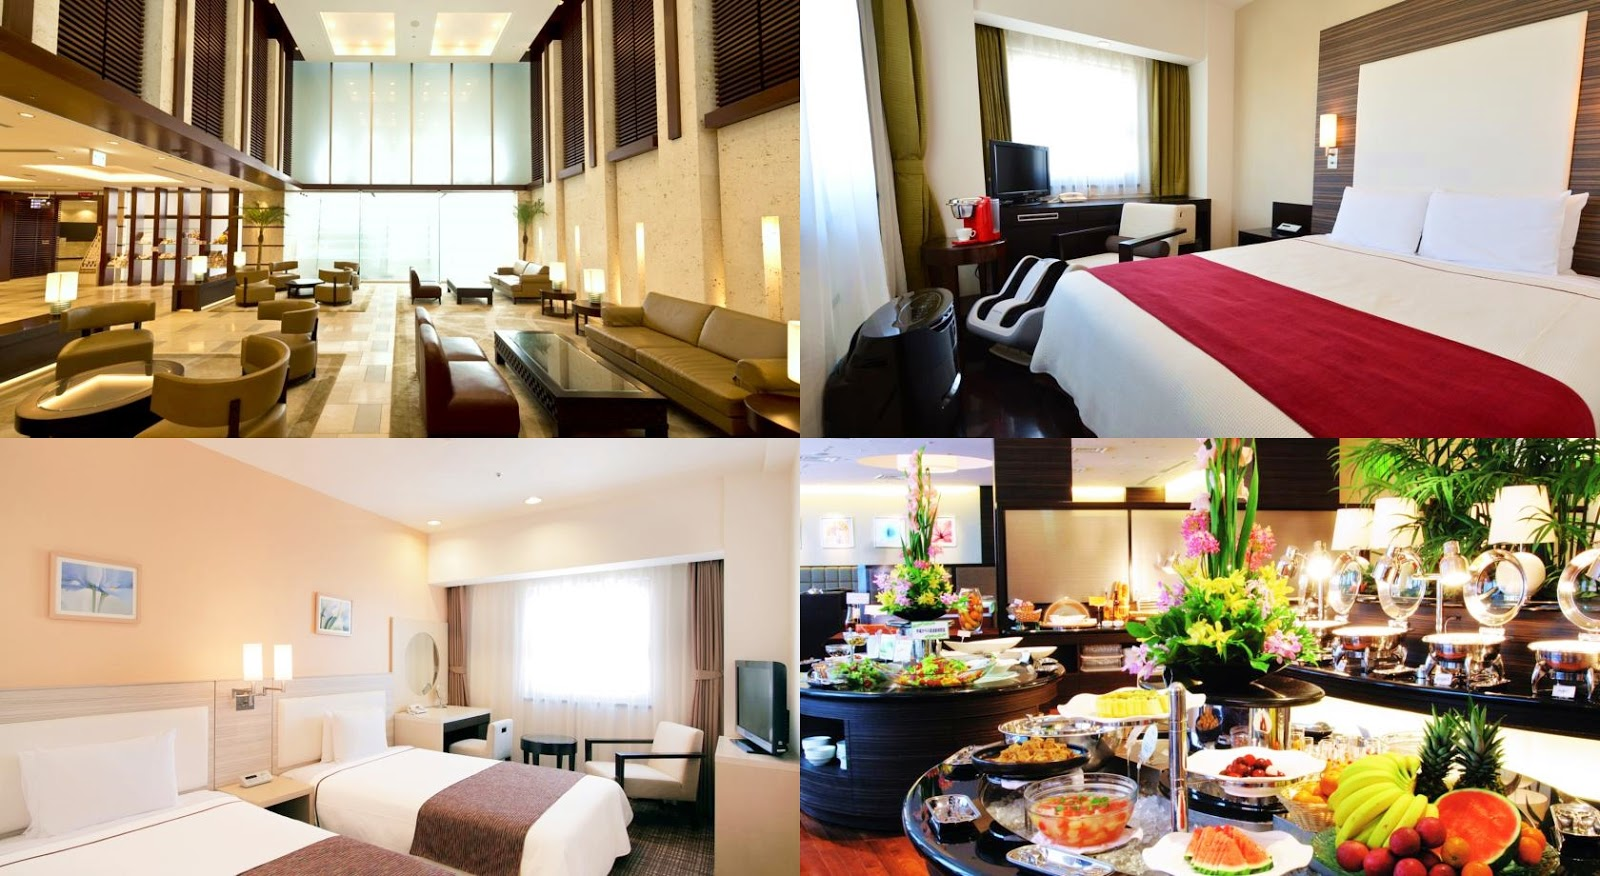 沖繩-住宿-推薦-那霸-日航城市酒店-Hotel-JAL-City-Naha-Okinawa-hotel-recommendation